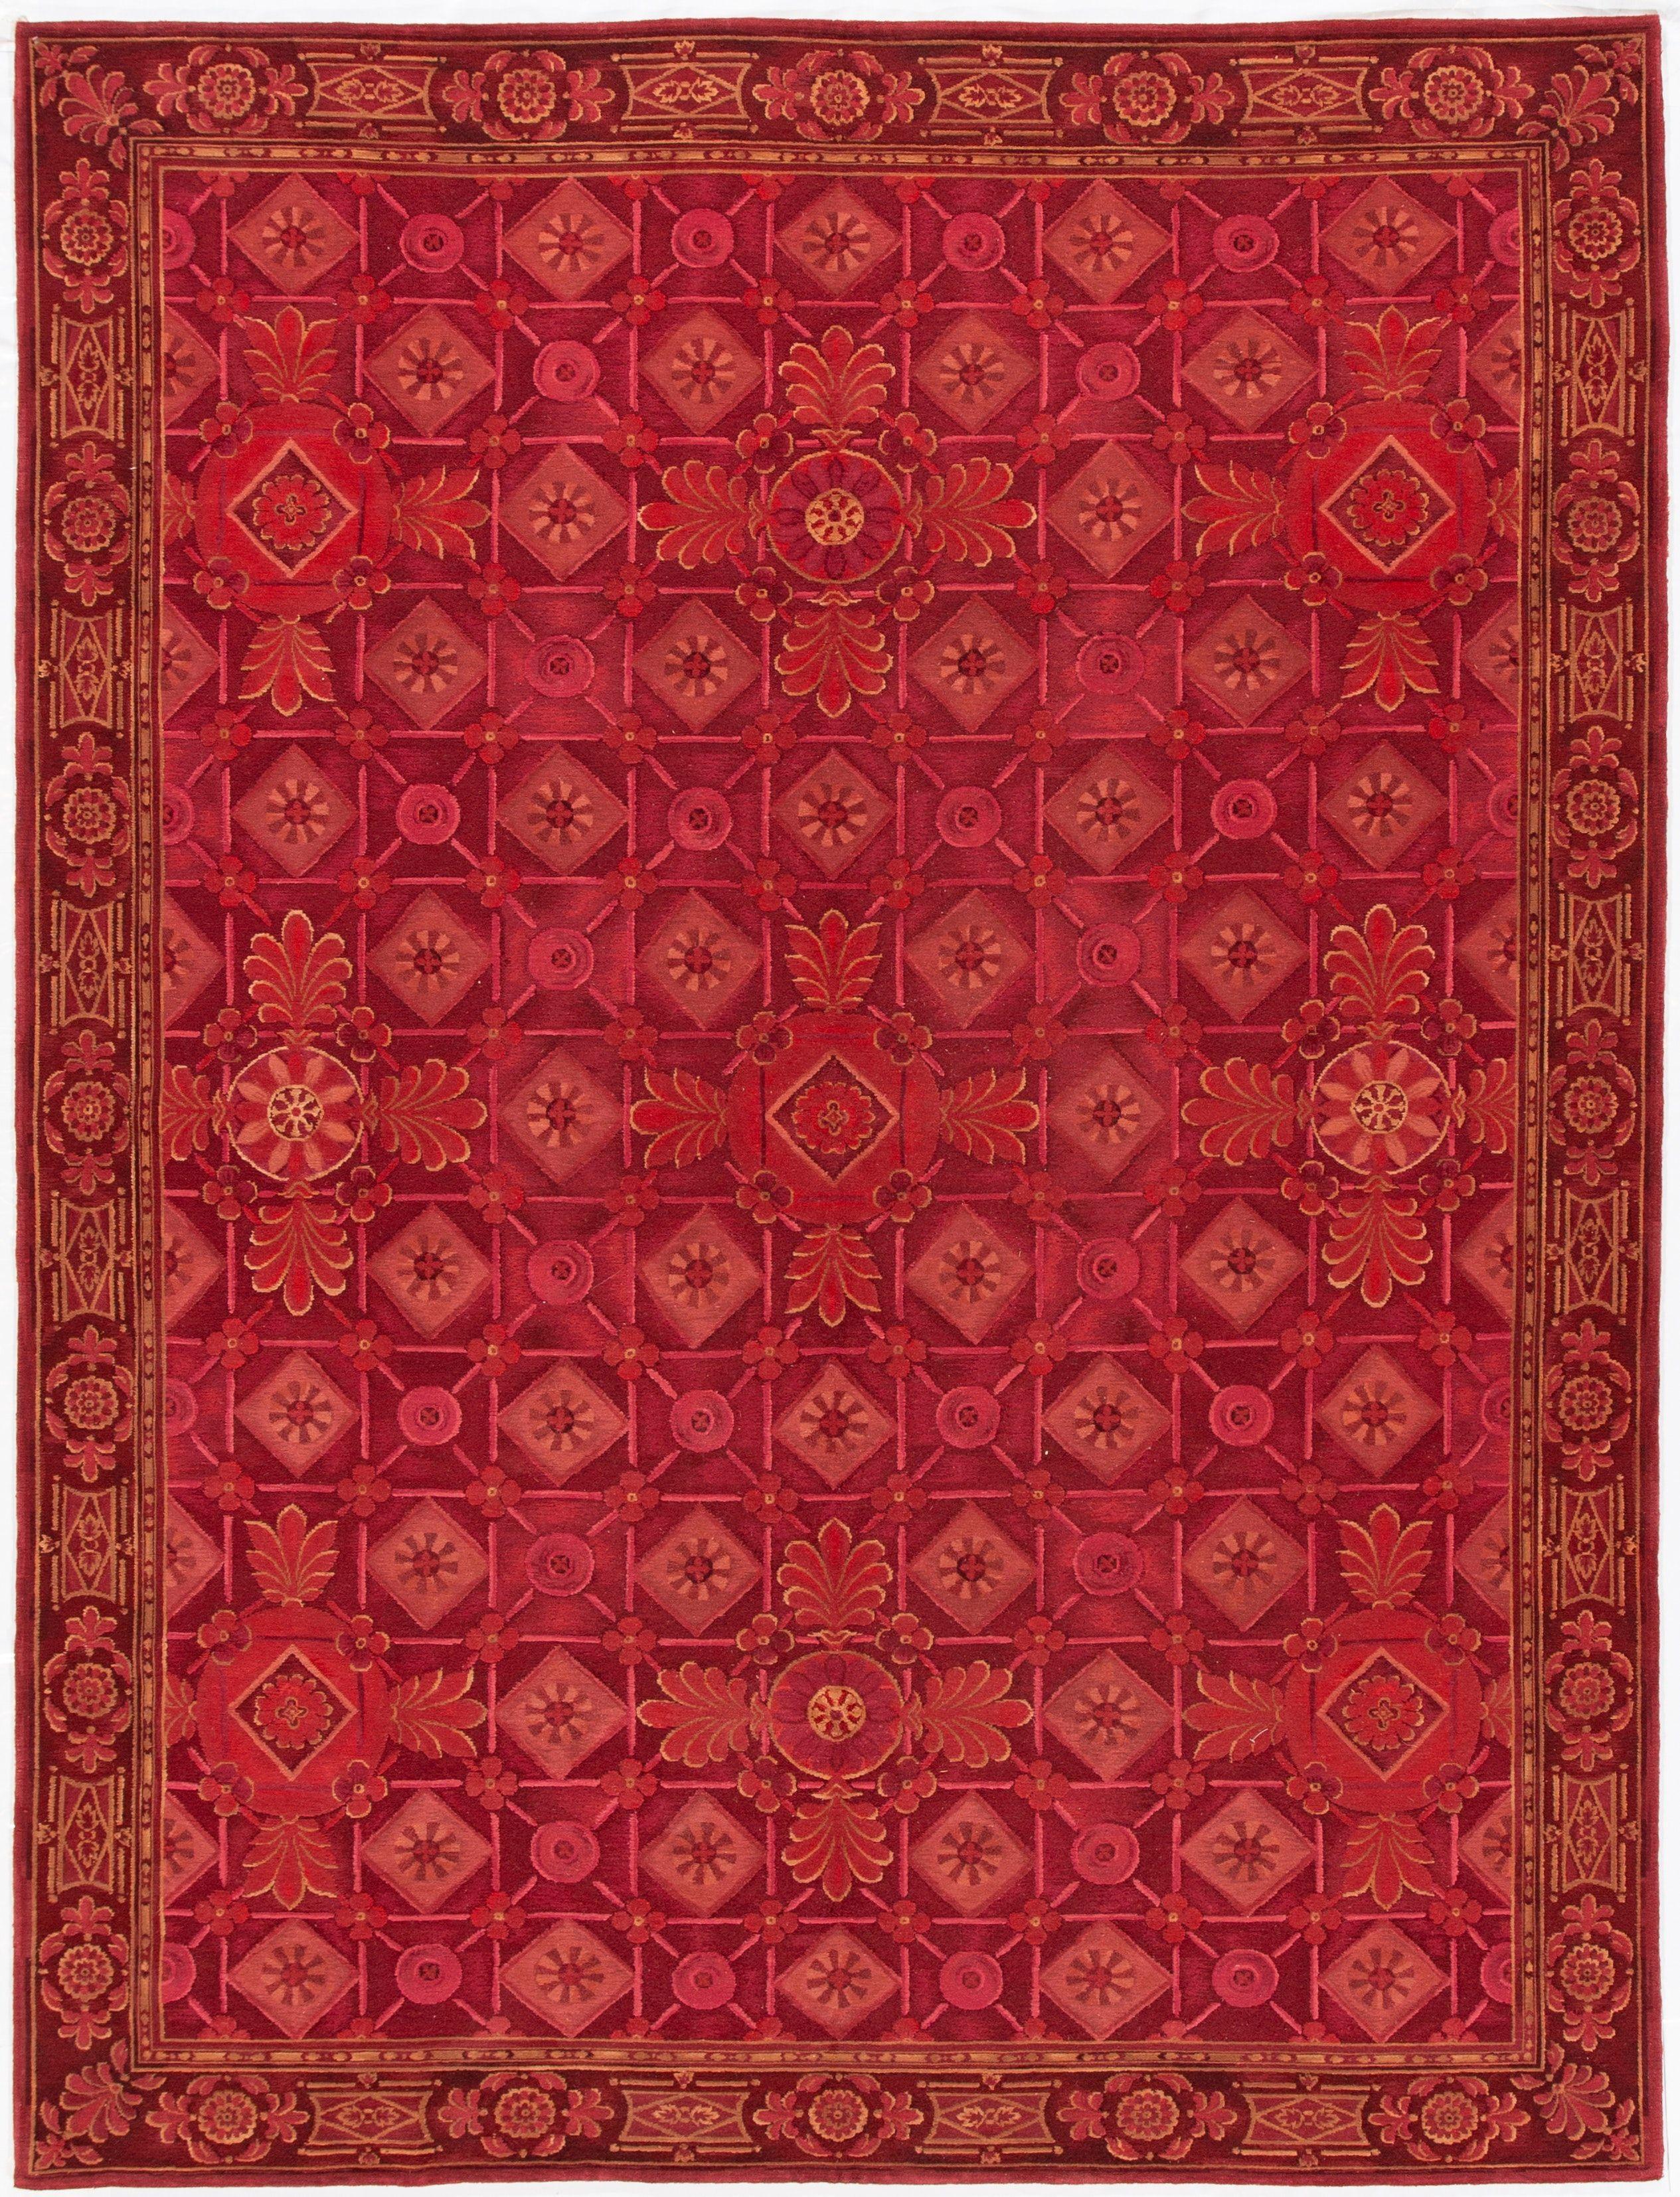 Contemporary Nepalese Rug, 9X12 by APADANA FINE RUGS ...